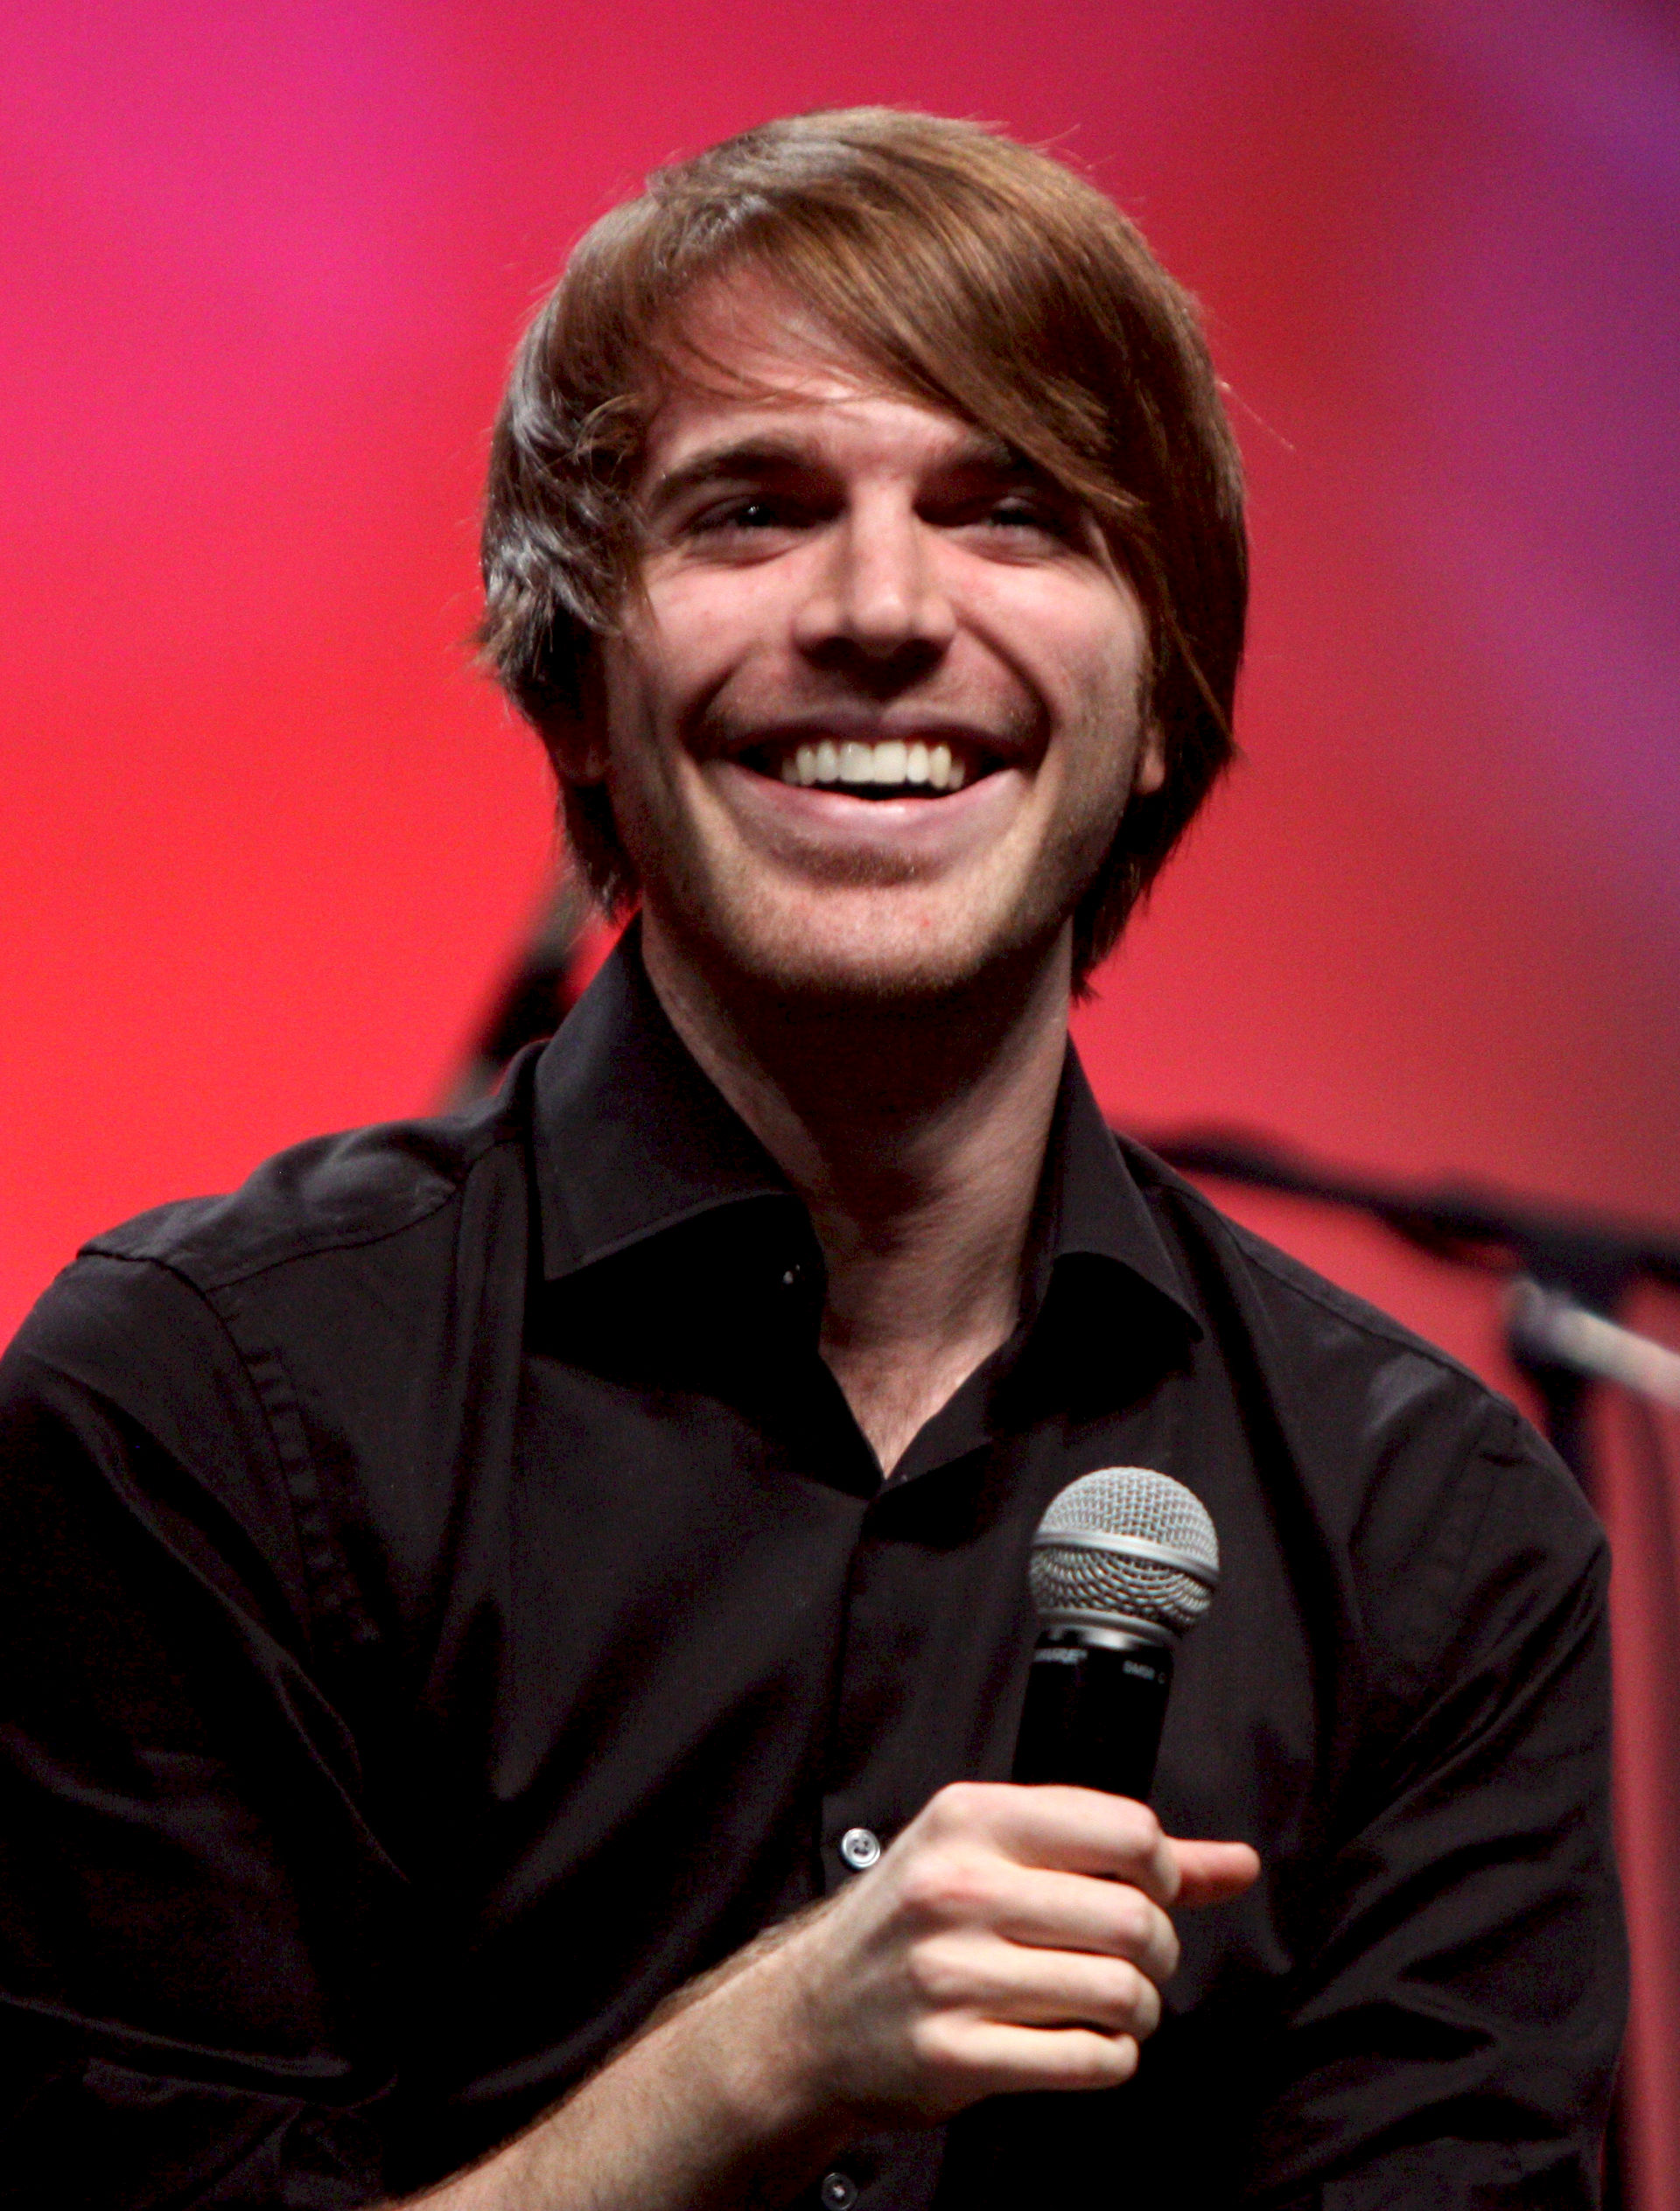 Photo of Shane Dawson: American Internet personality